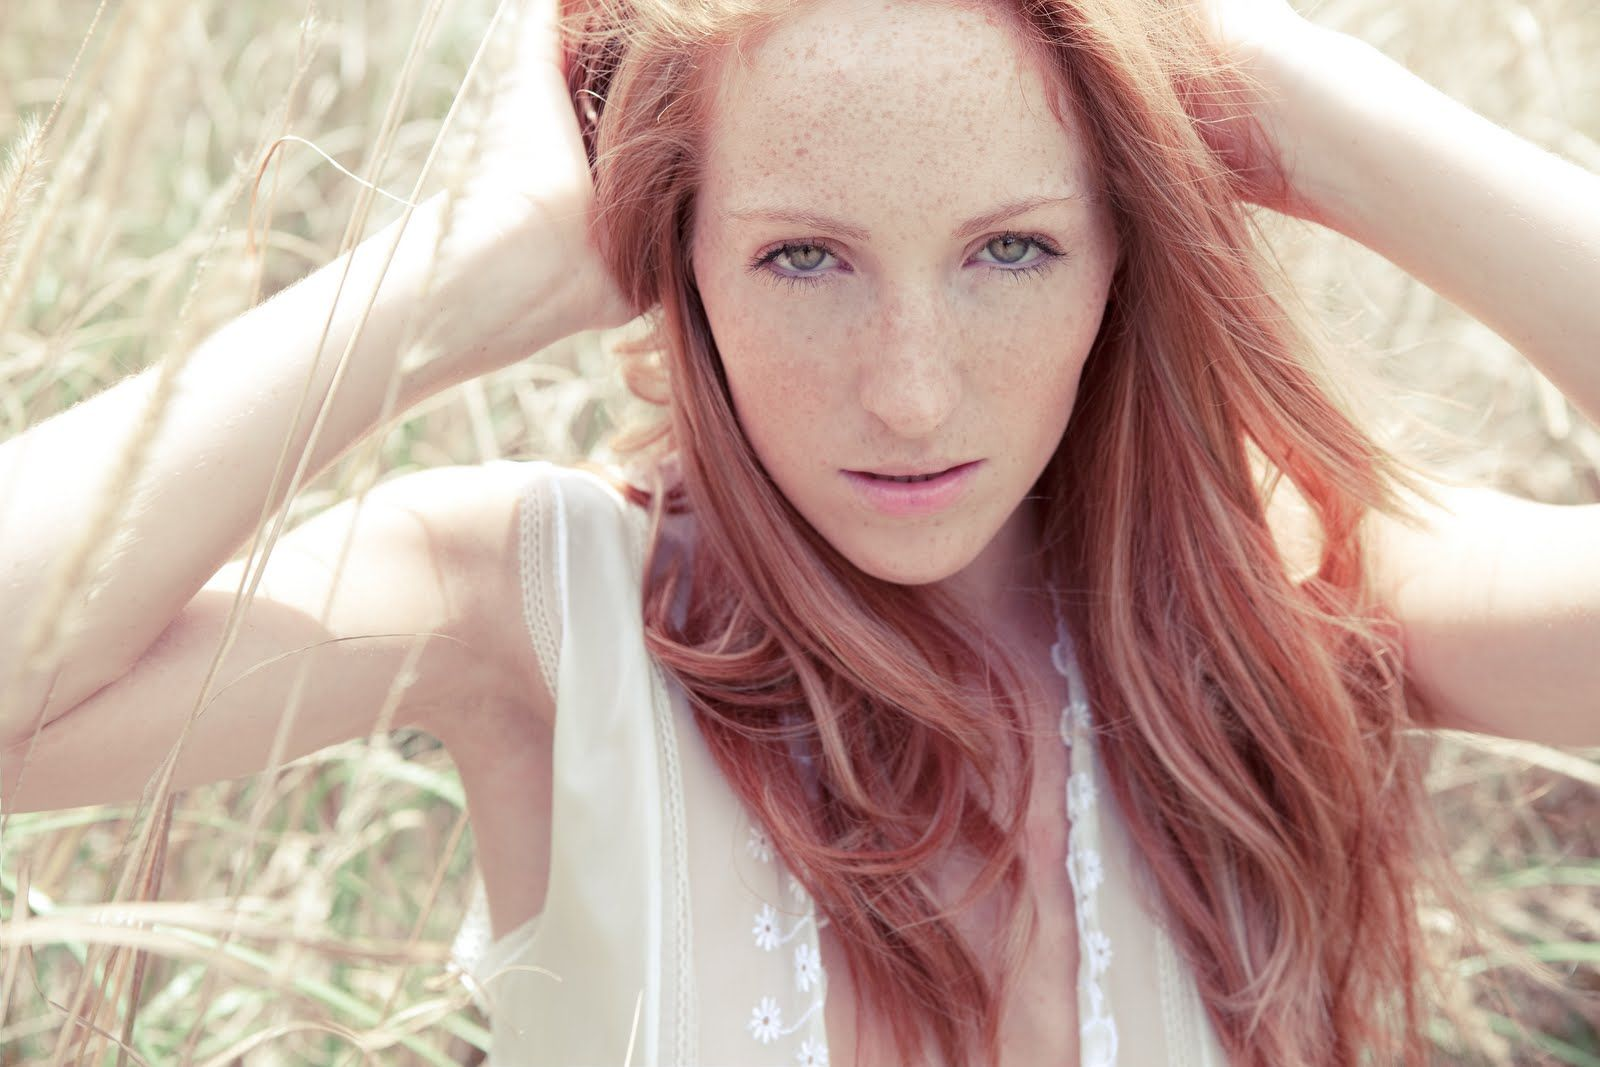 Pale white redhead, hong kong anal sex